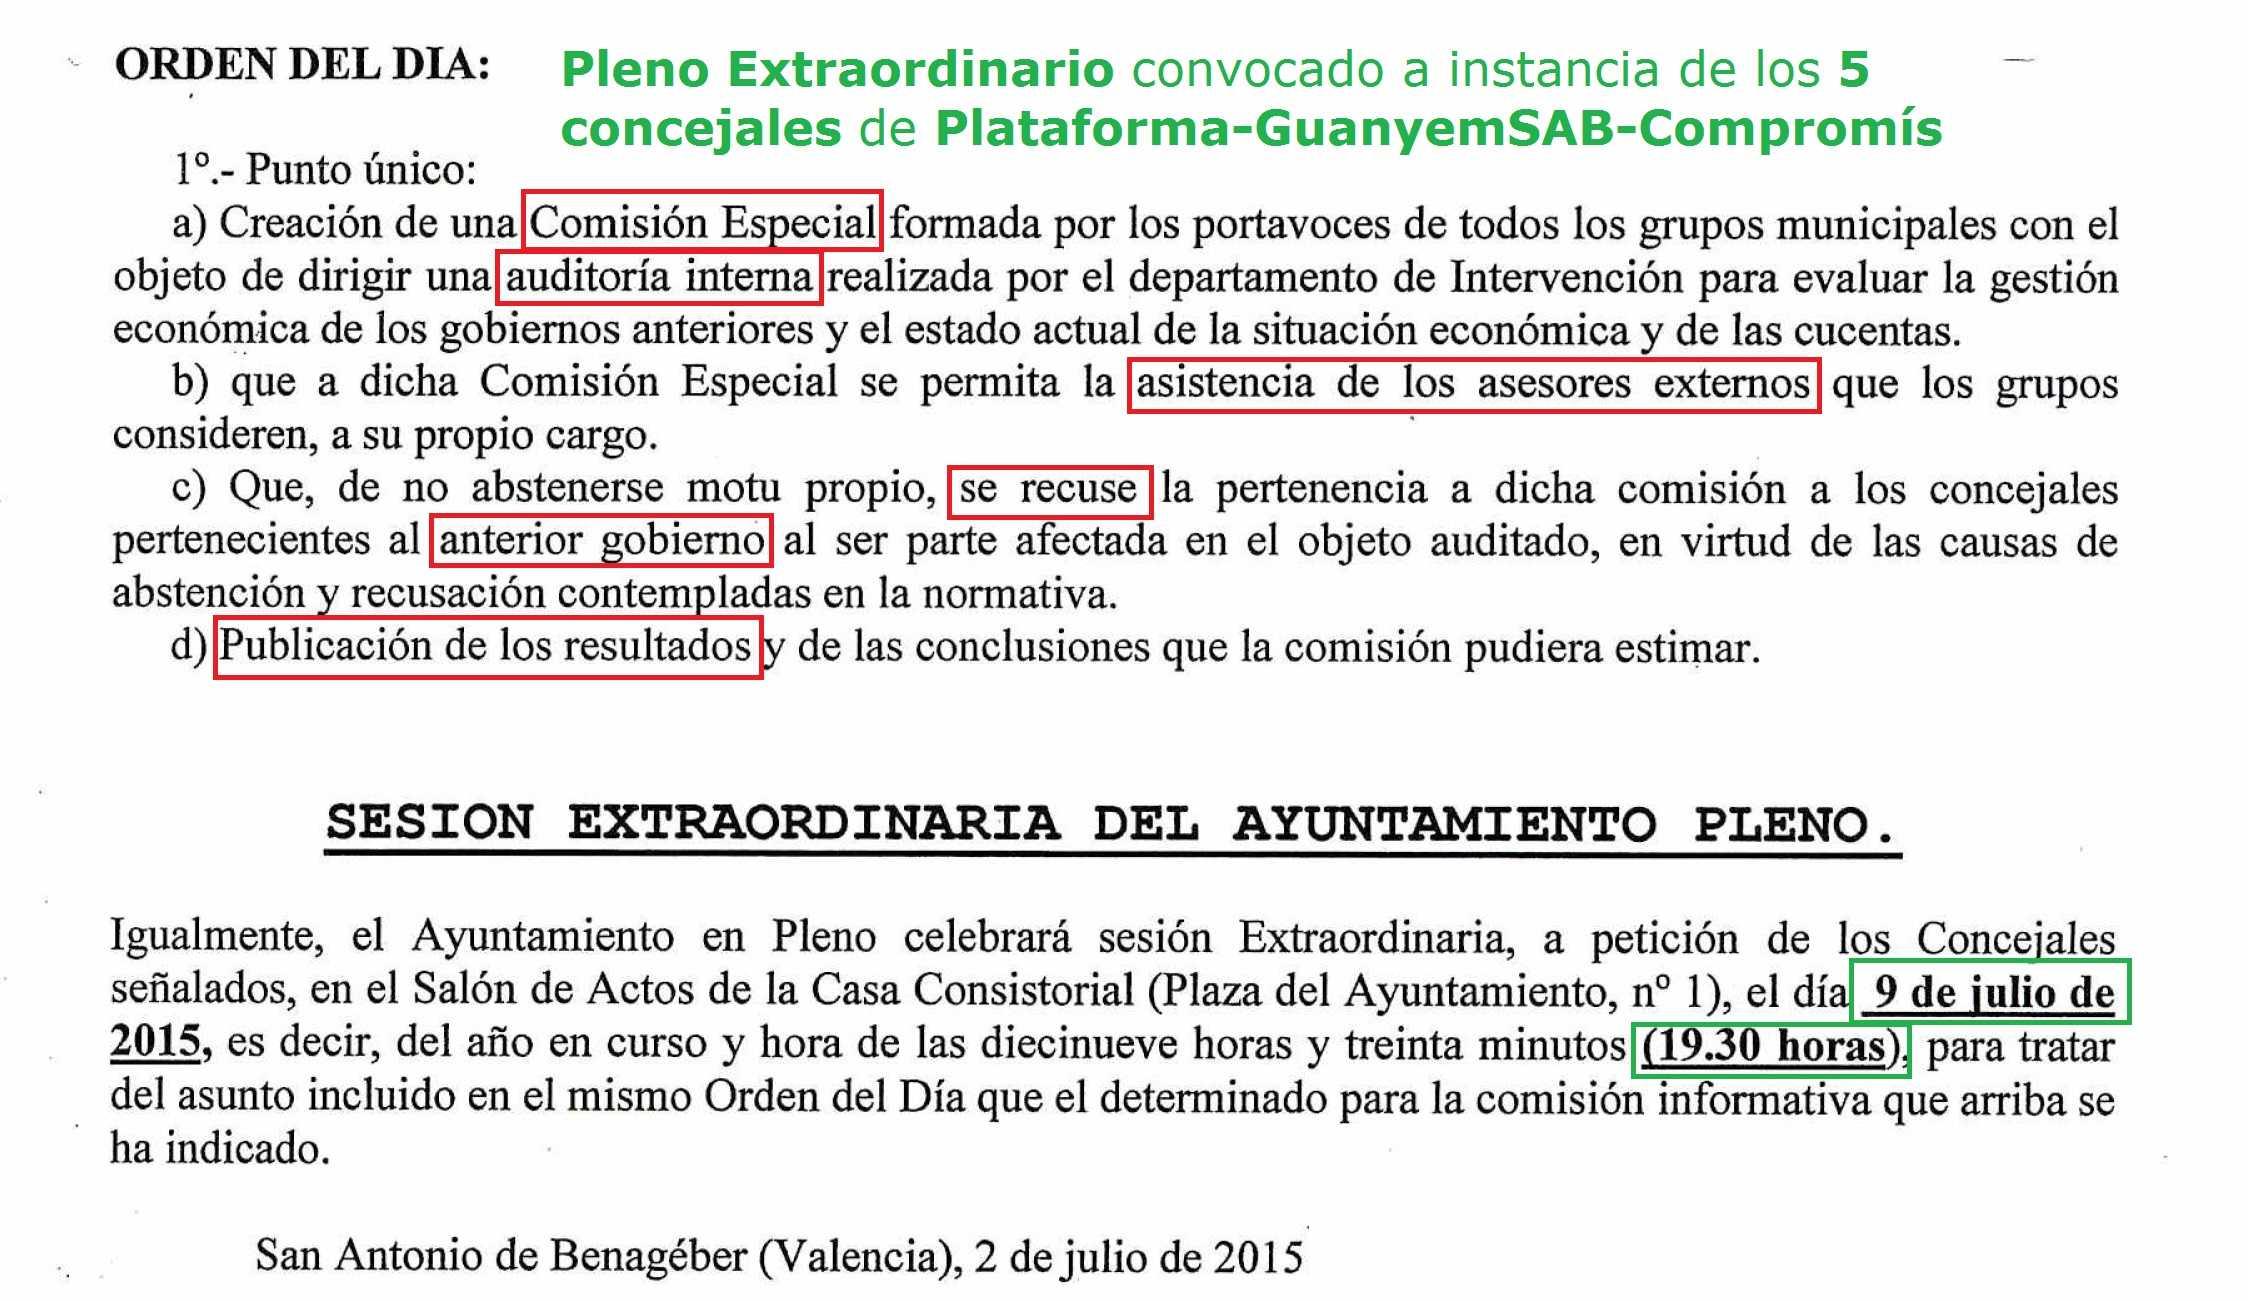 Pleno Extraordinario AUDITORIA 9 julio 2015